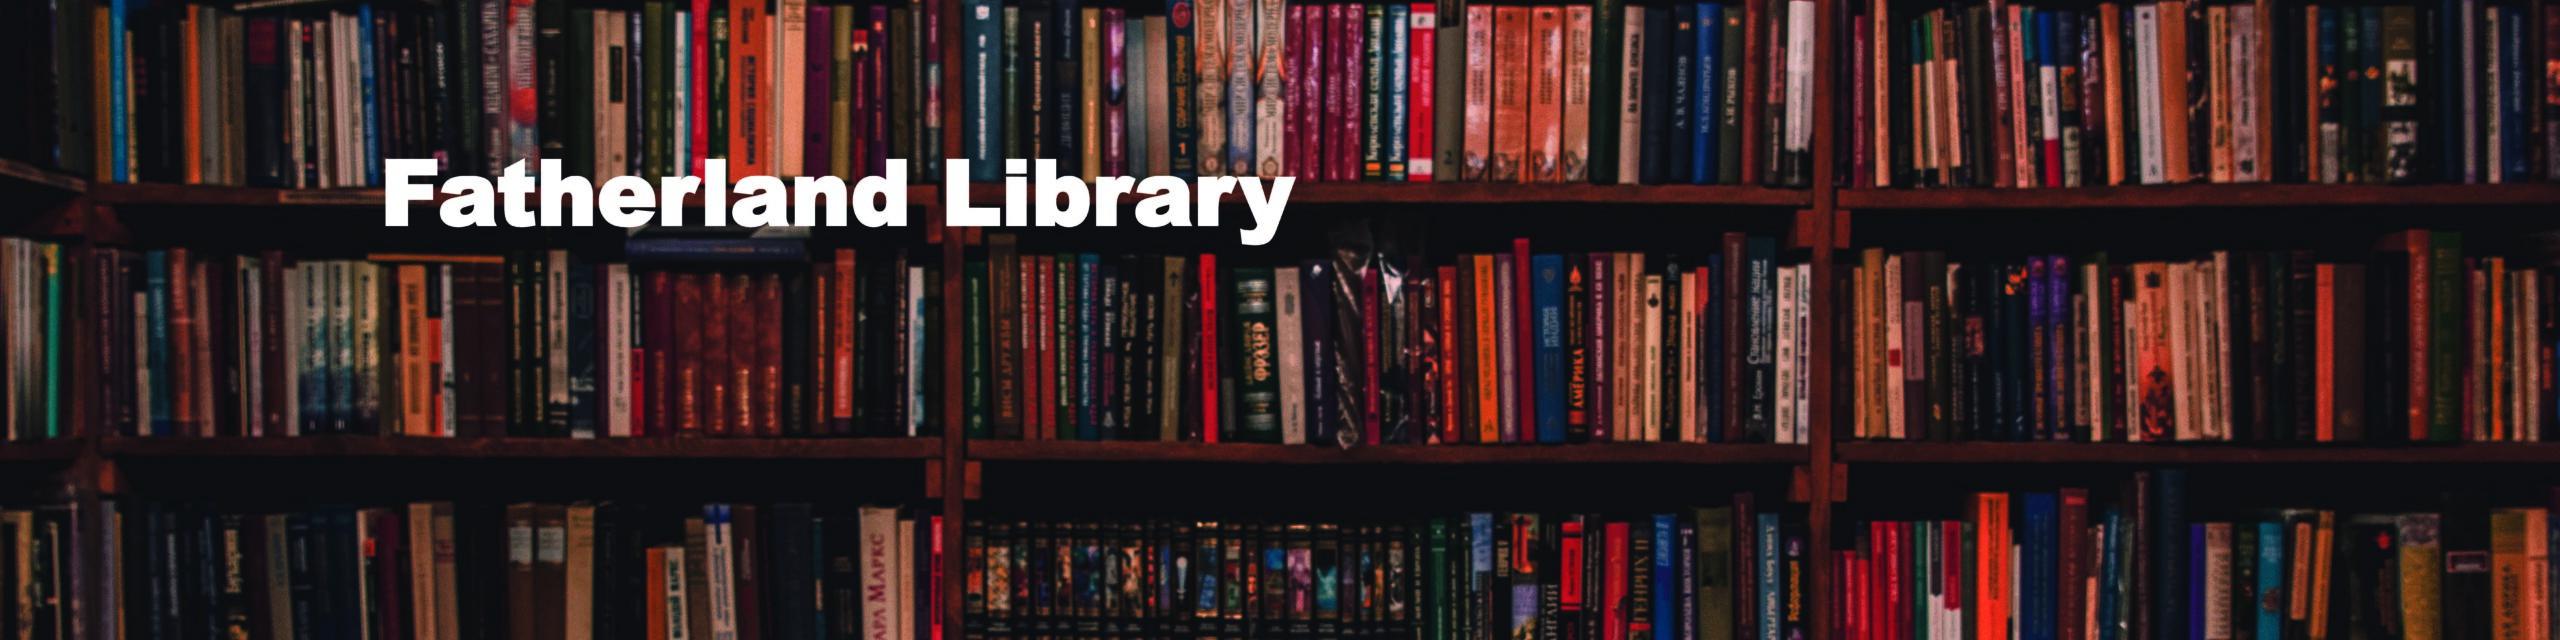 Fatherland Library-books05